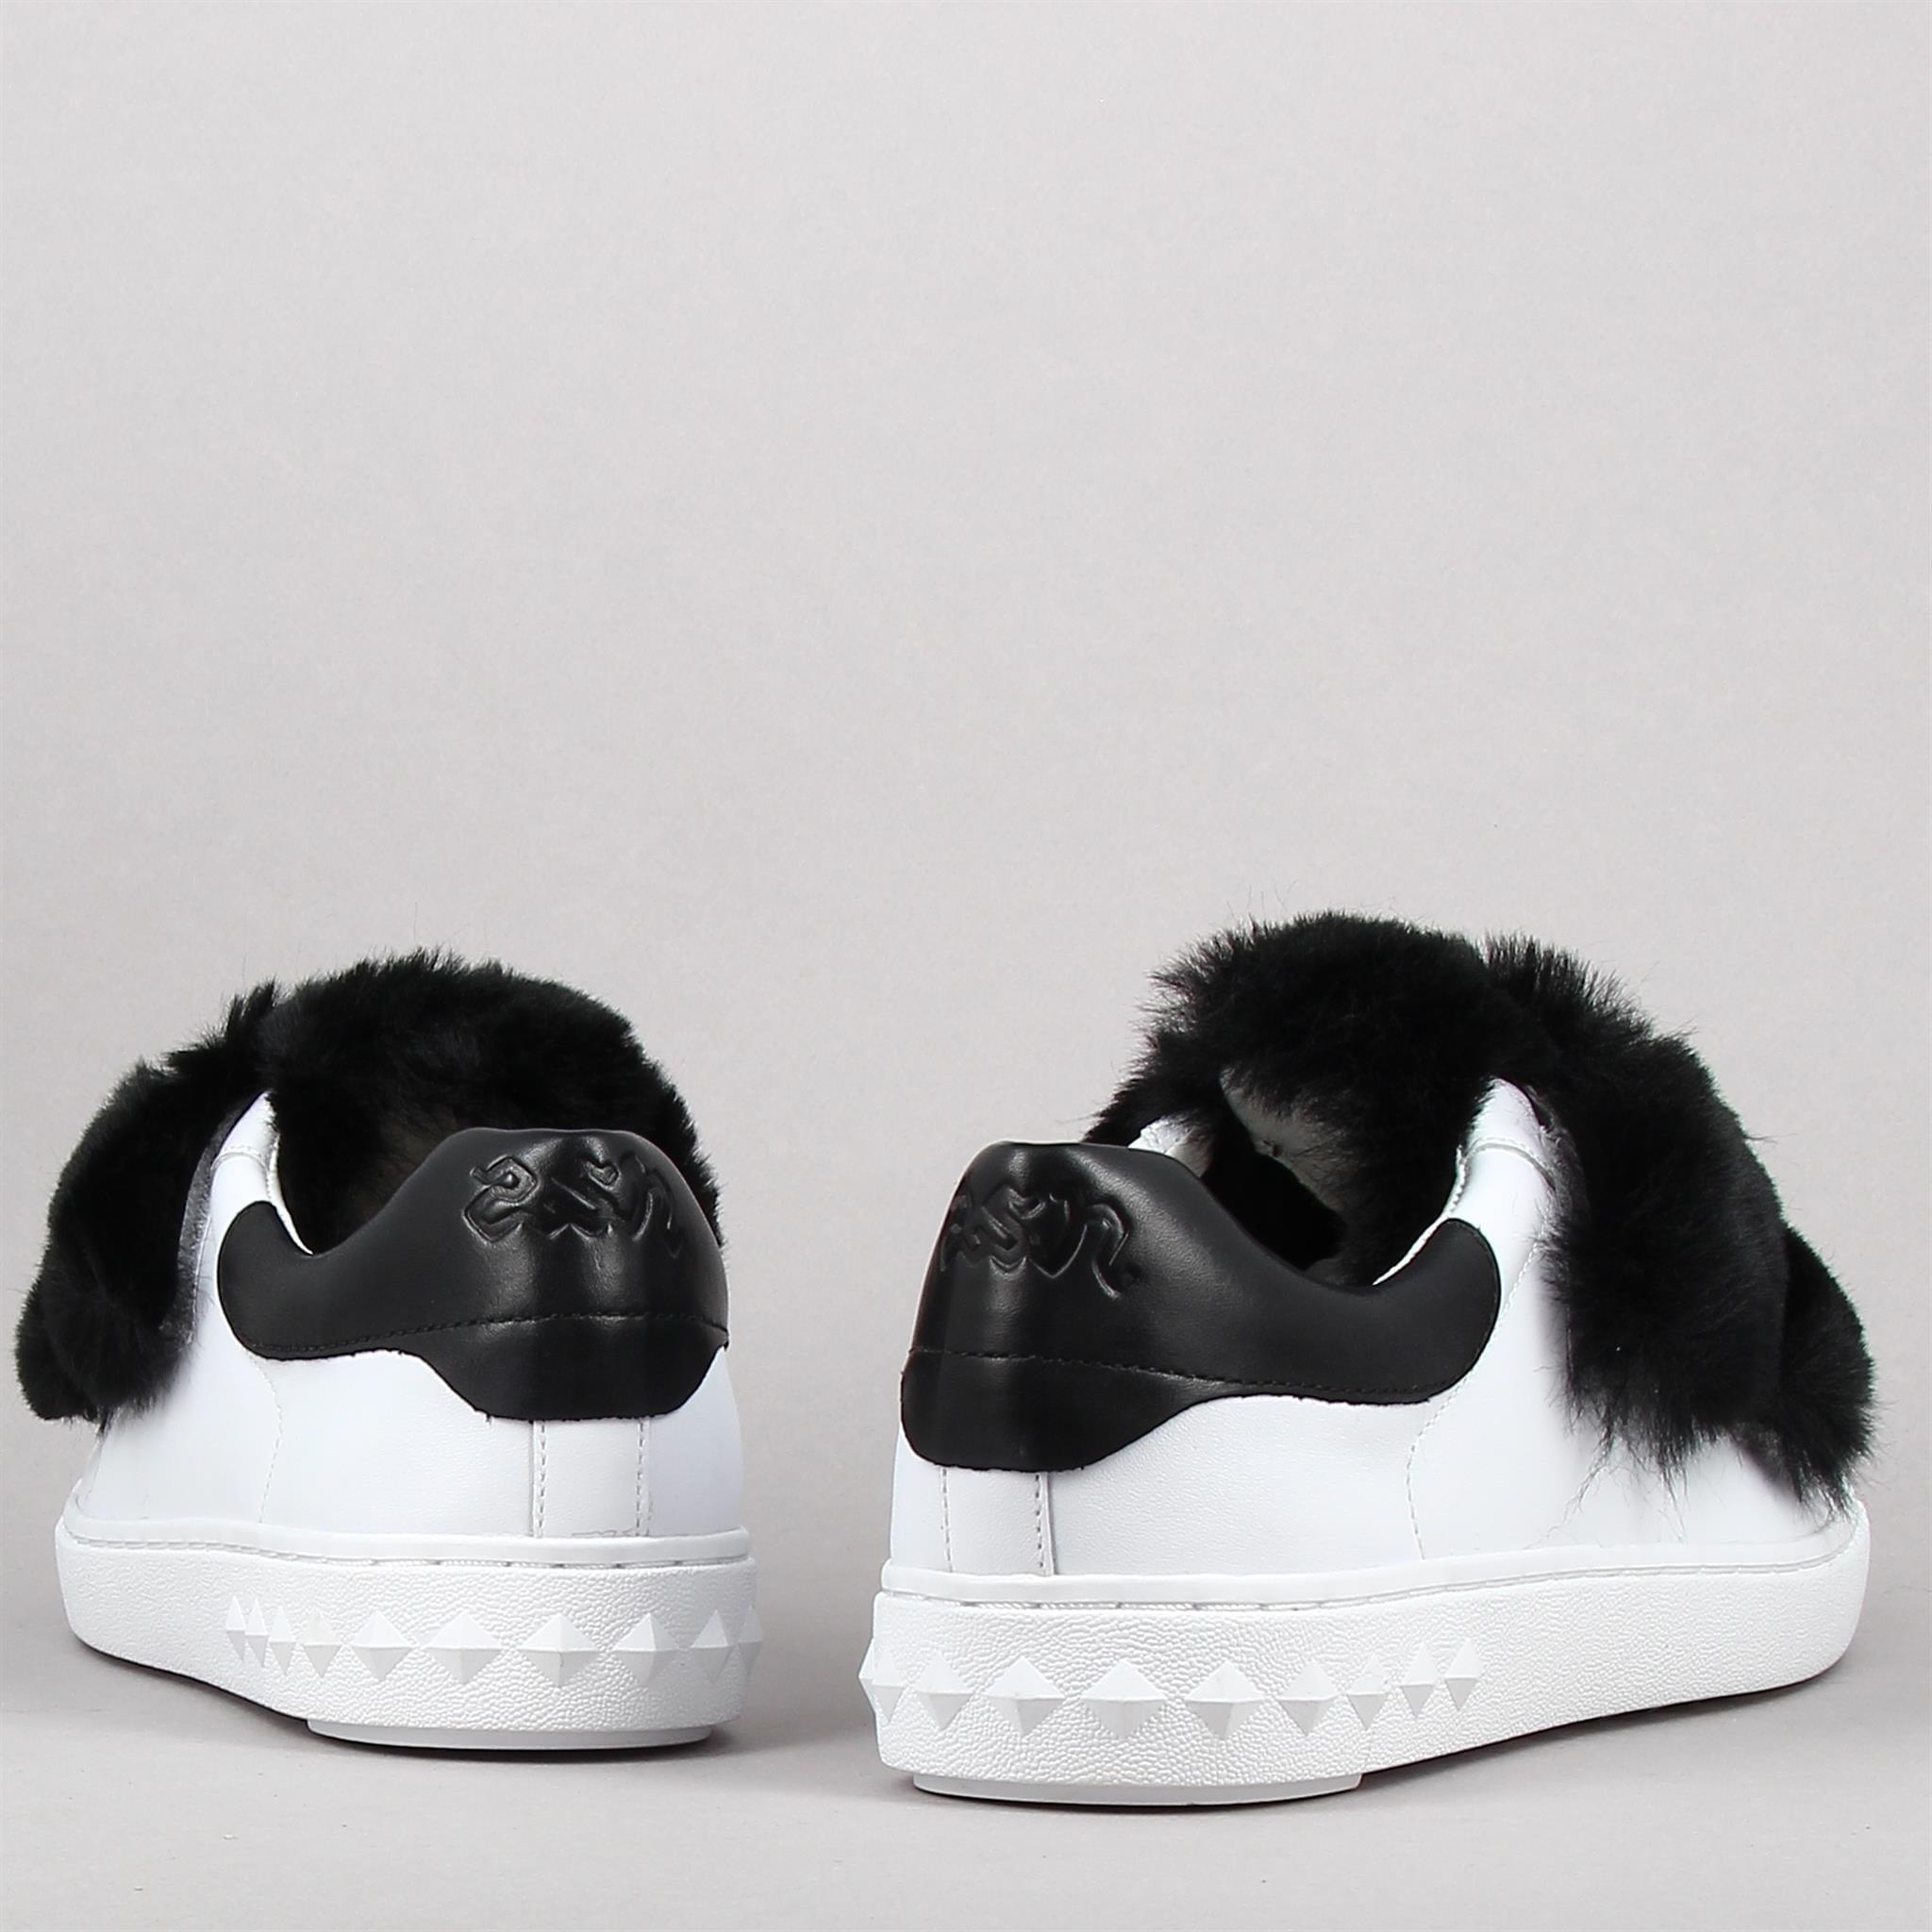 panda-noir-153763842-1.jpg